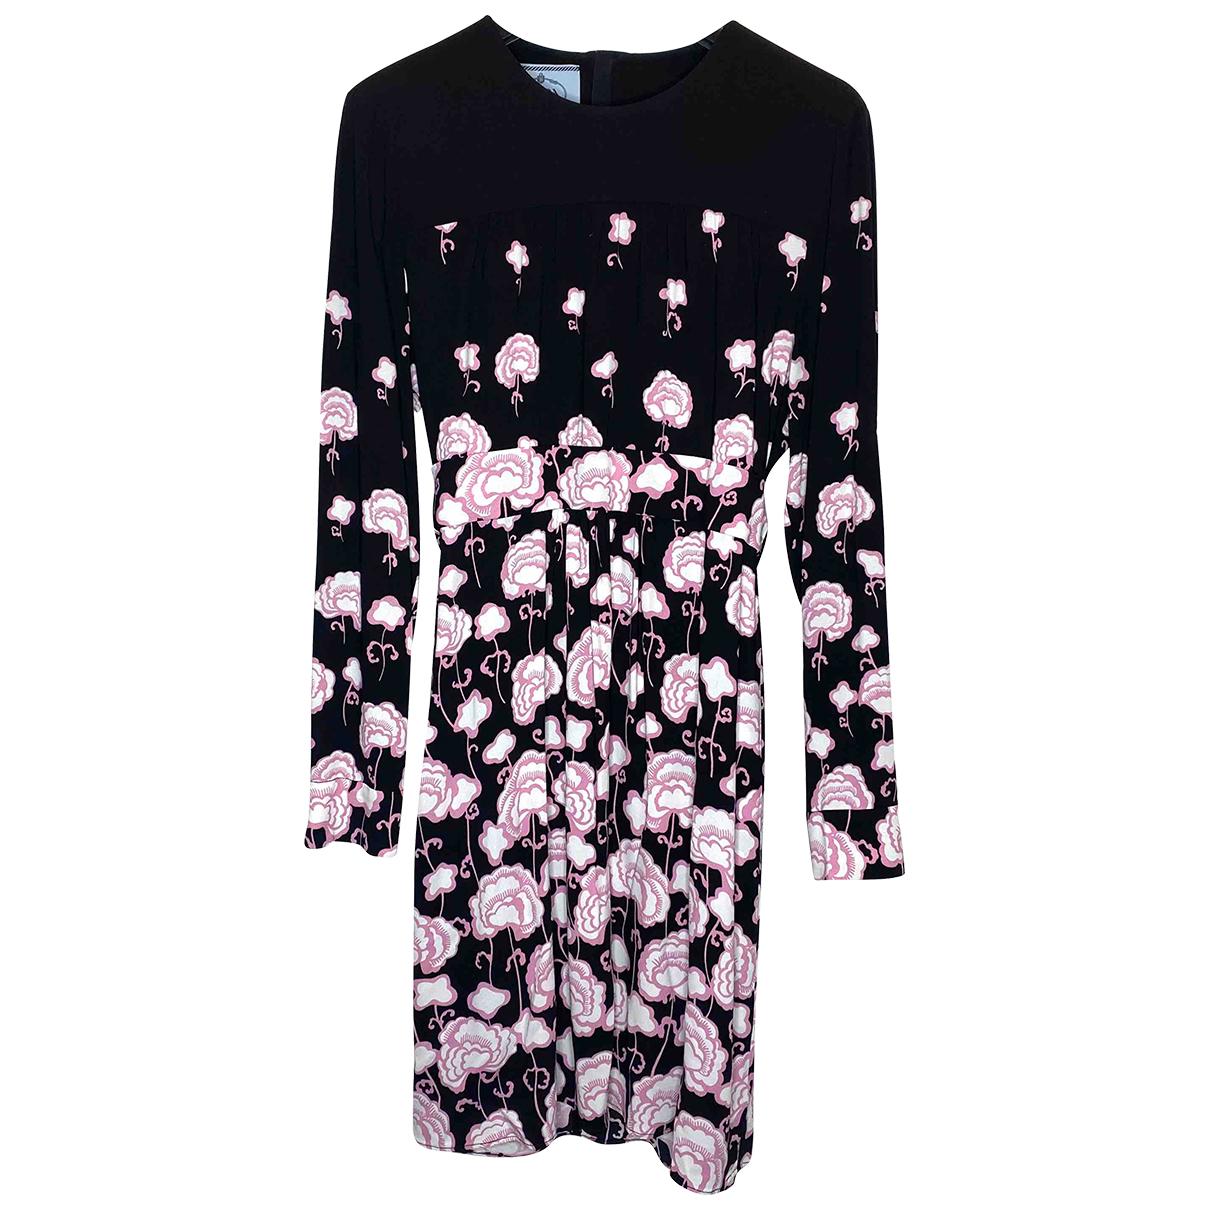 Prada N Black dress for Women 44 IT